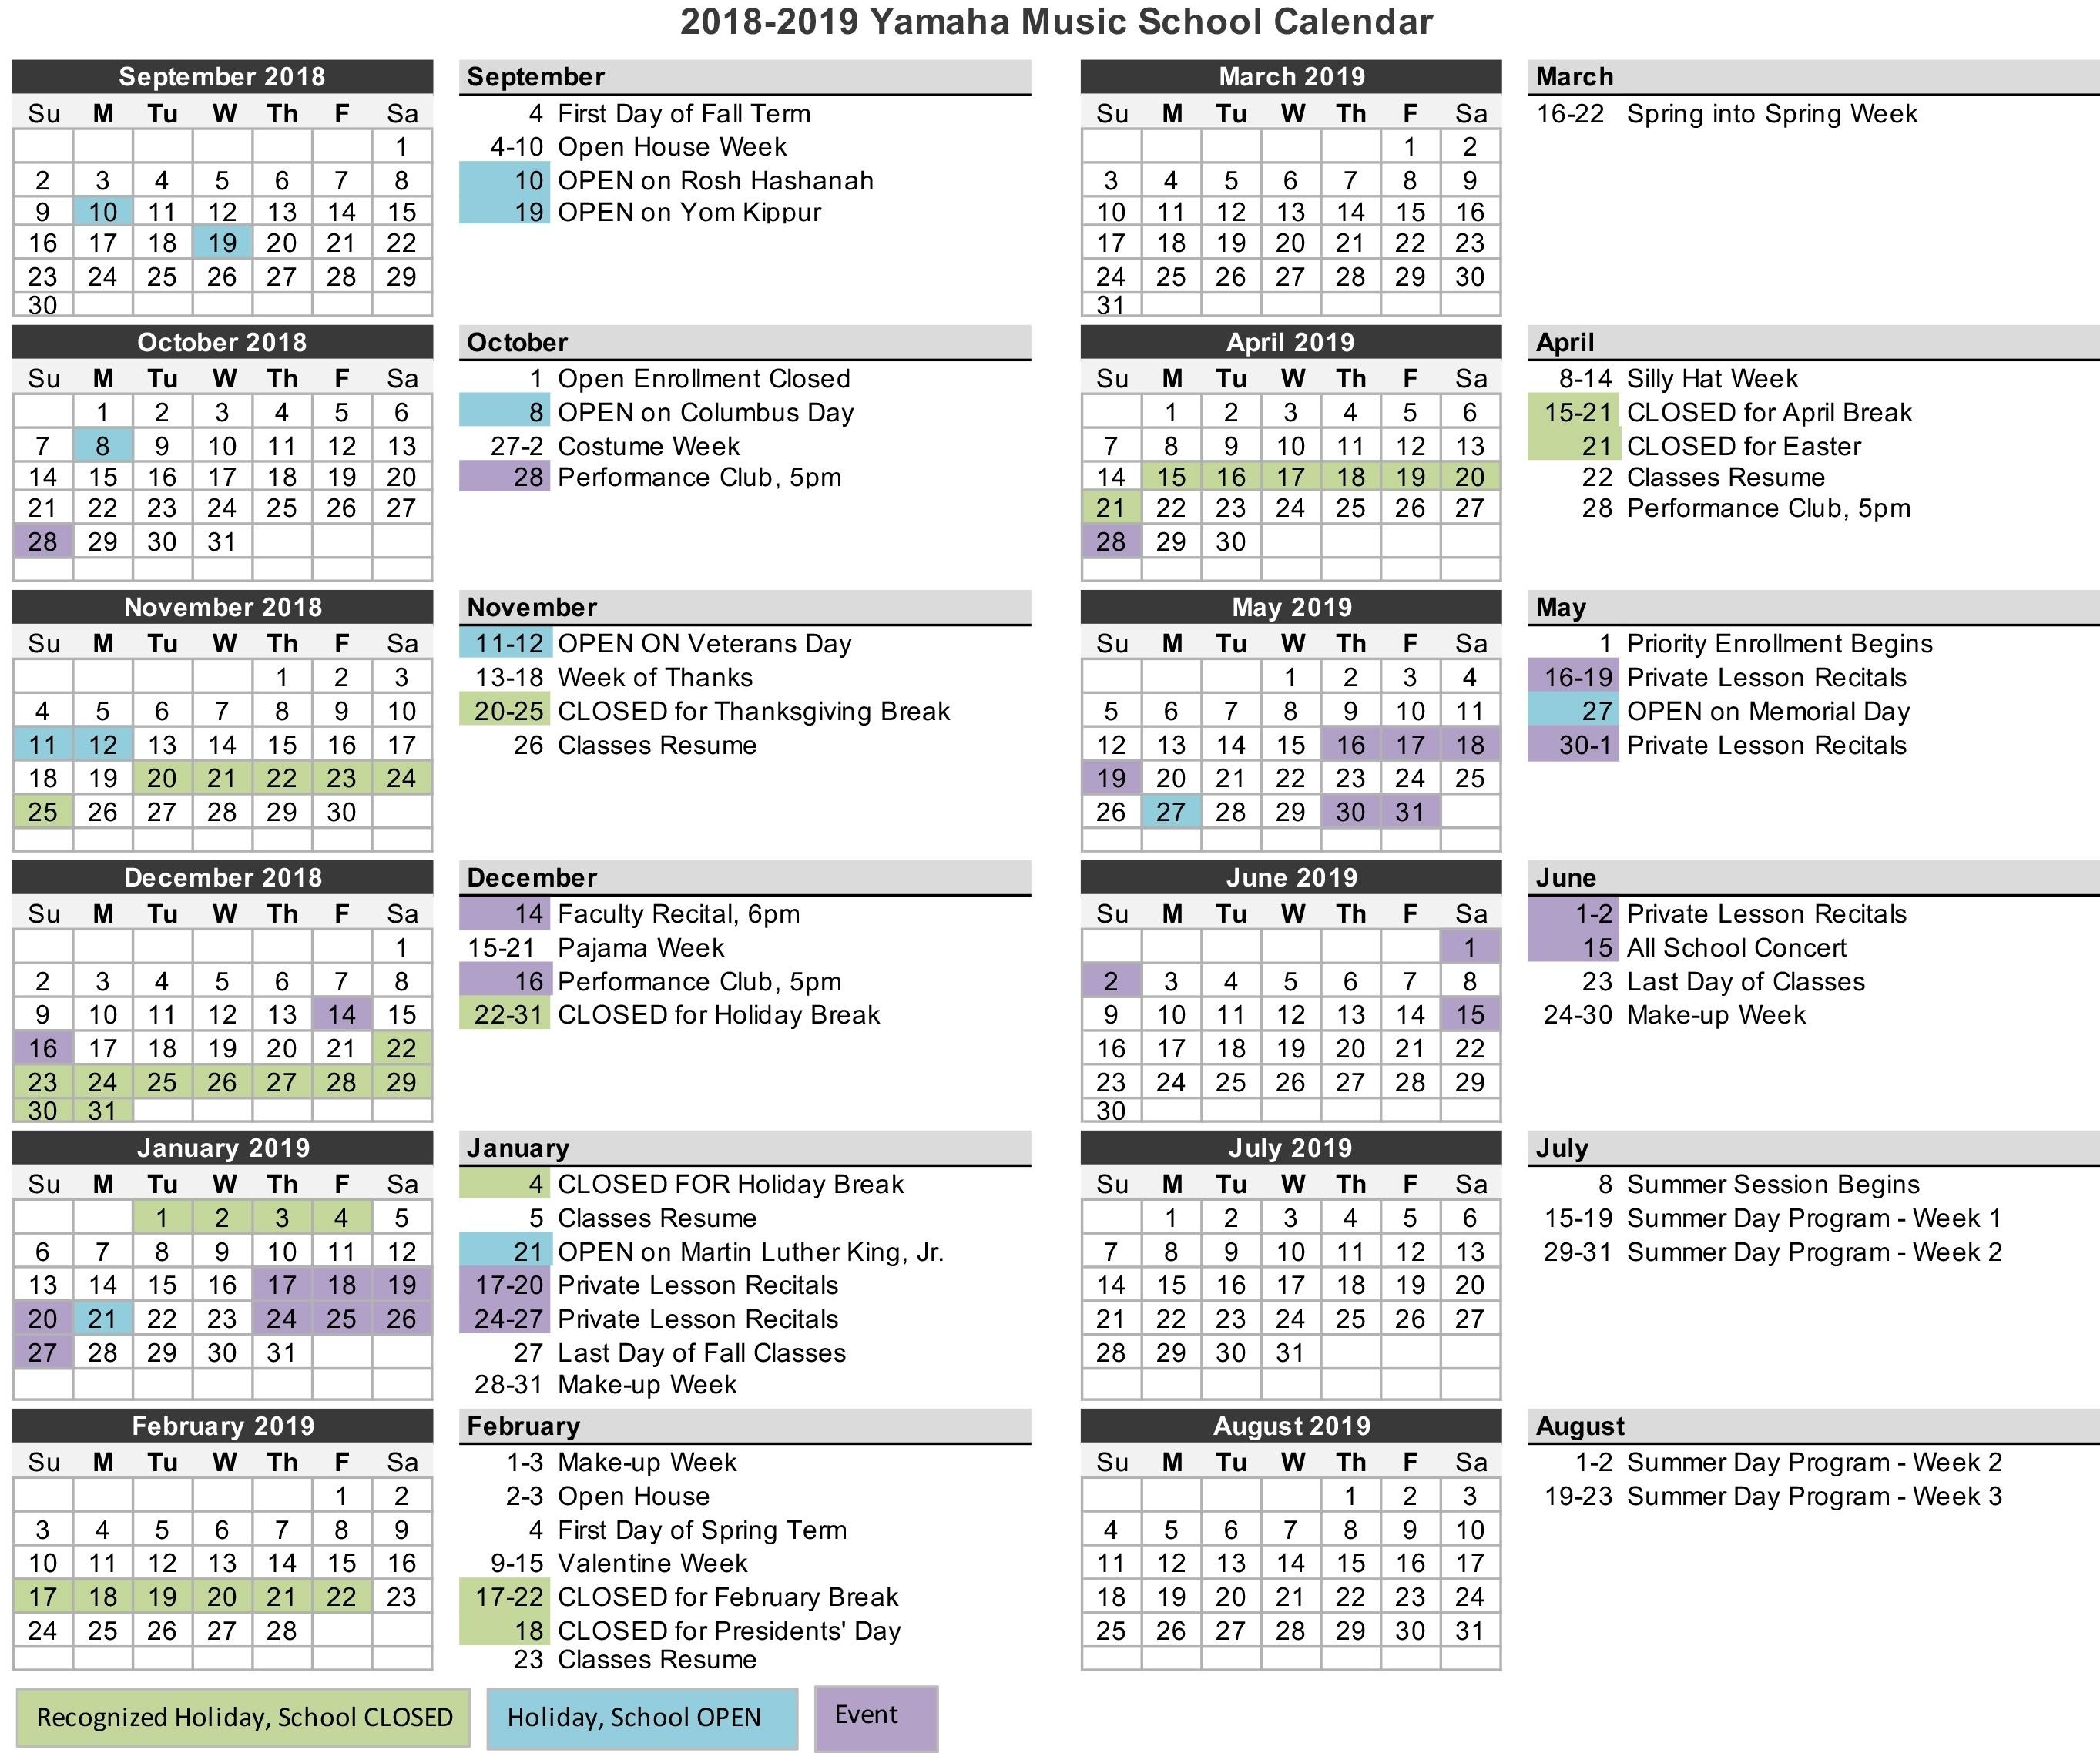 School Calendar   Yamaha Music School Exceptional 9 Week School Calendar